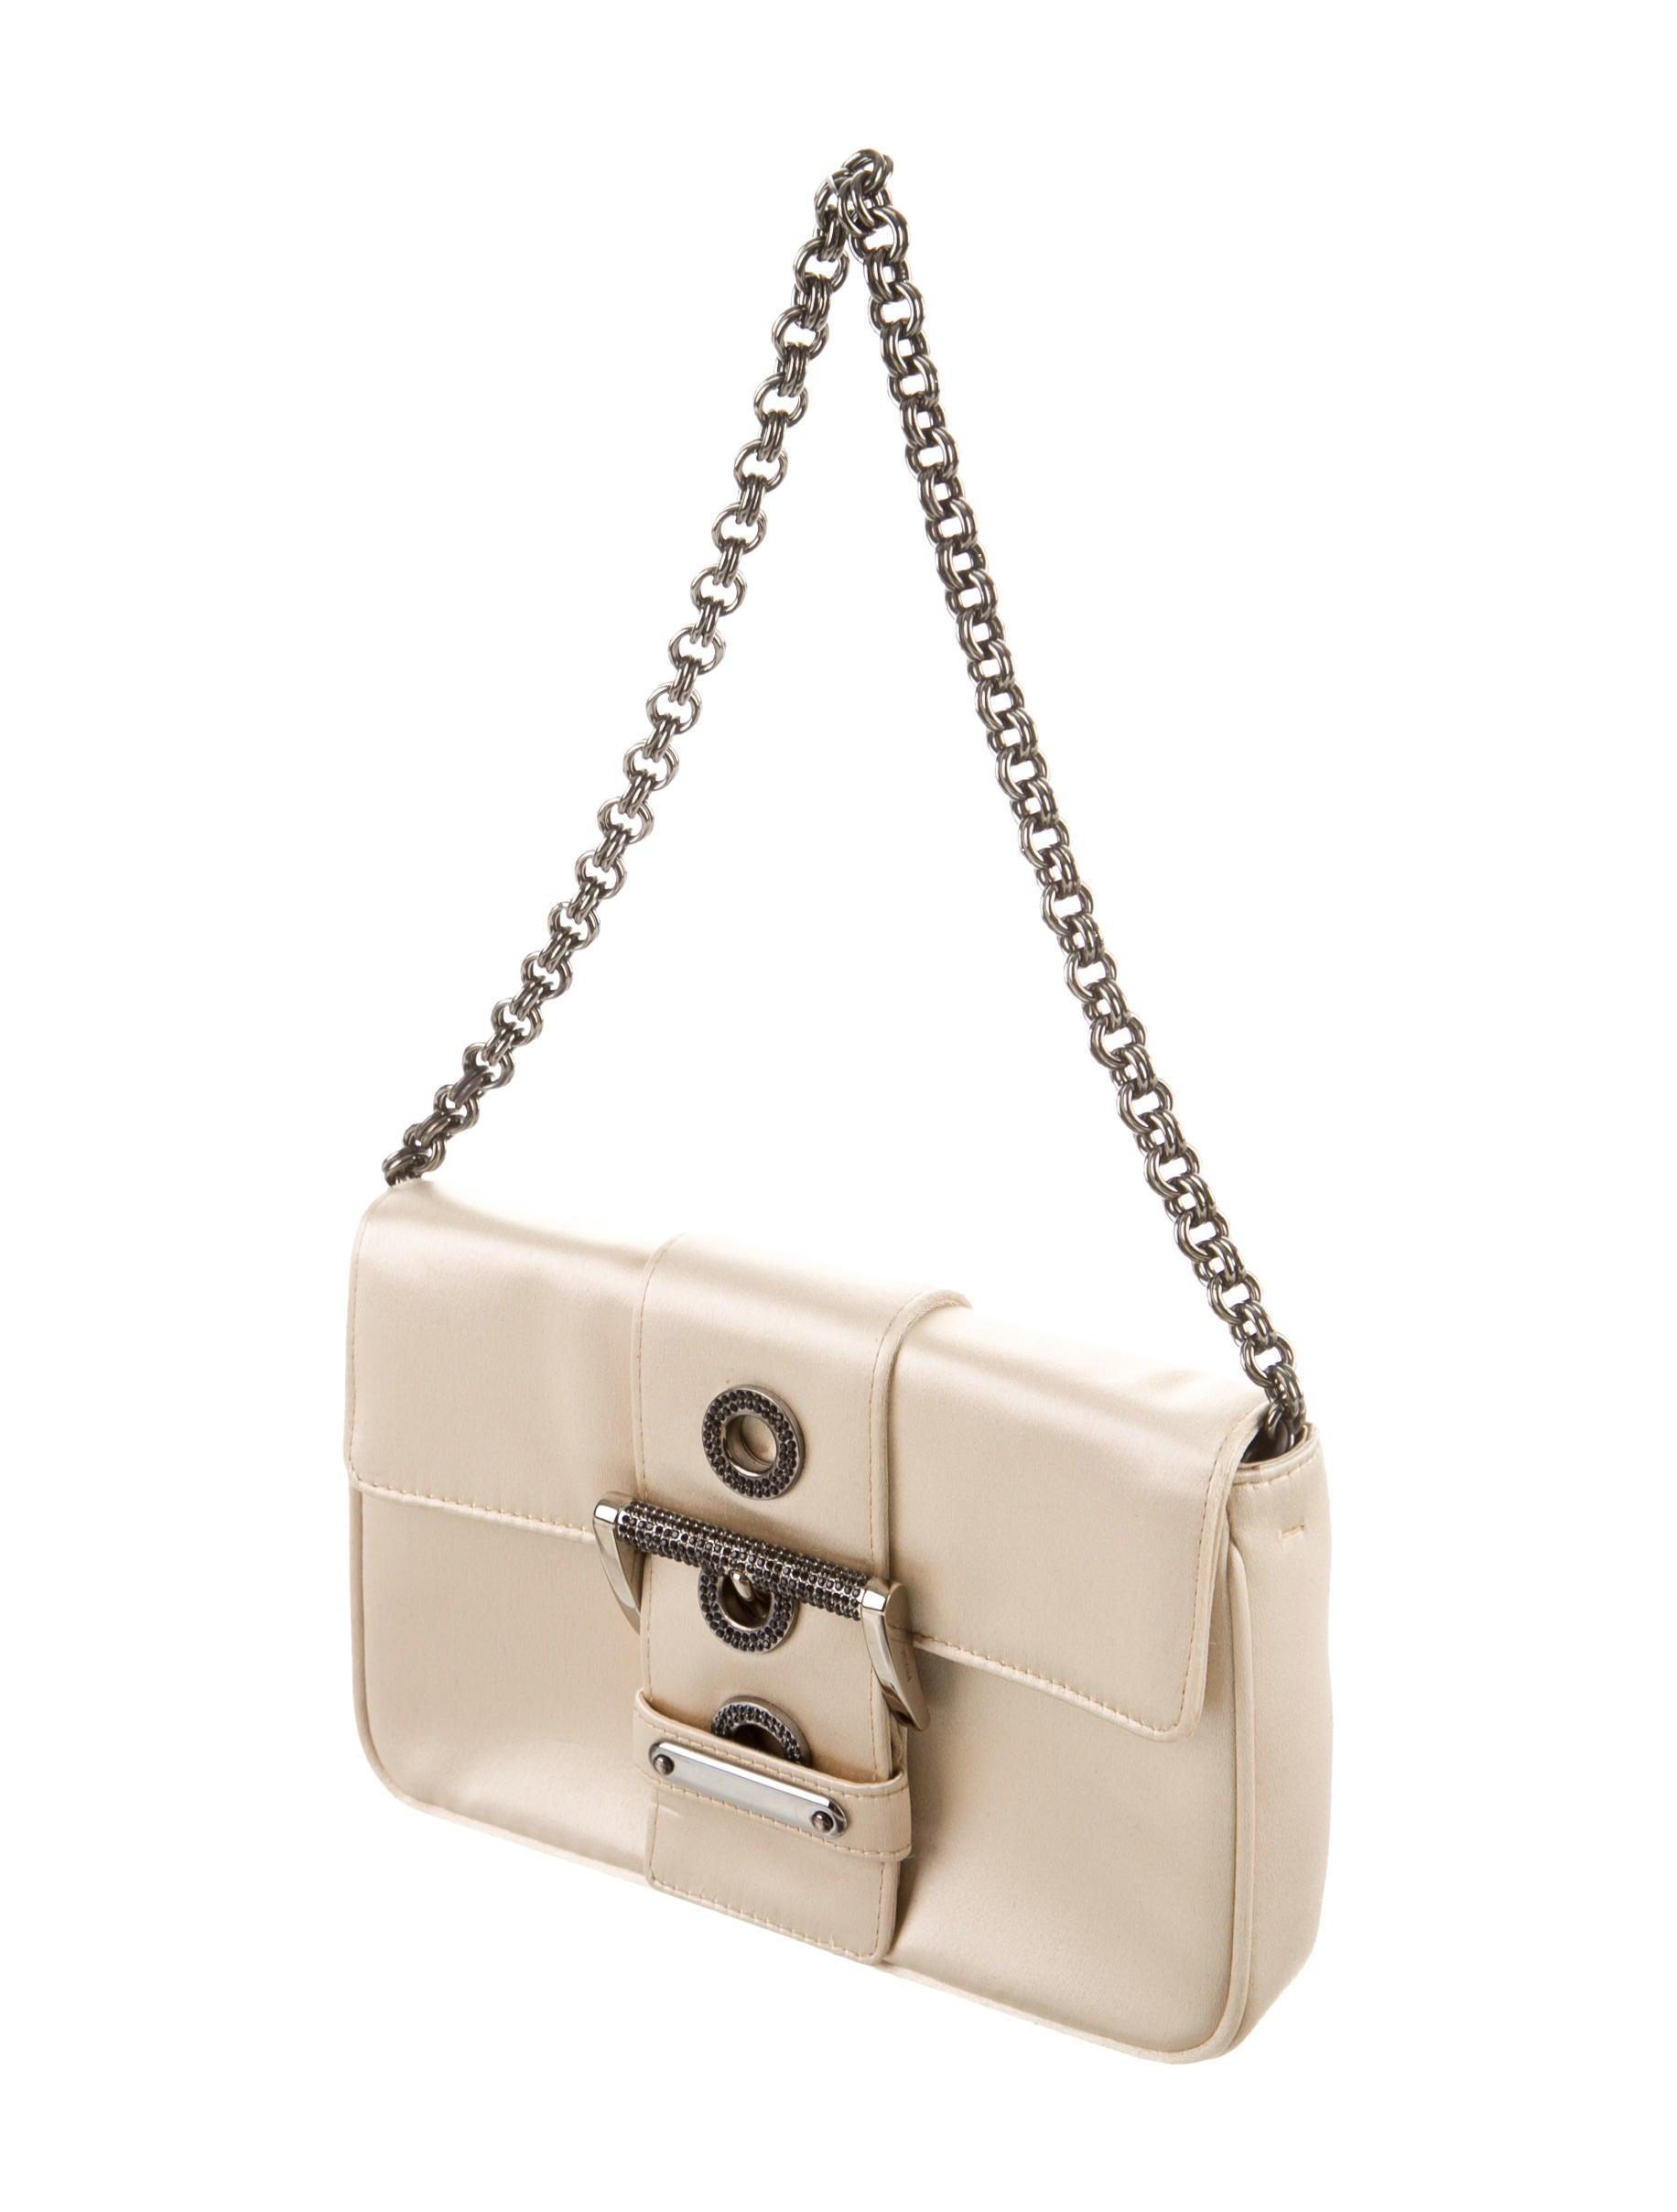 Prada Embellished Satin Clutch - Handbags - PRA81636   The RealReal